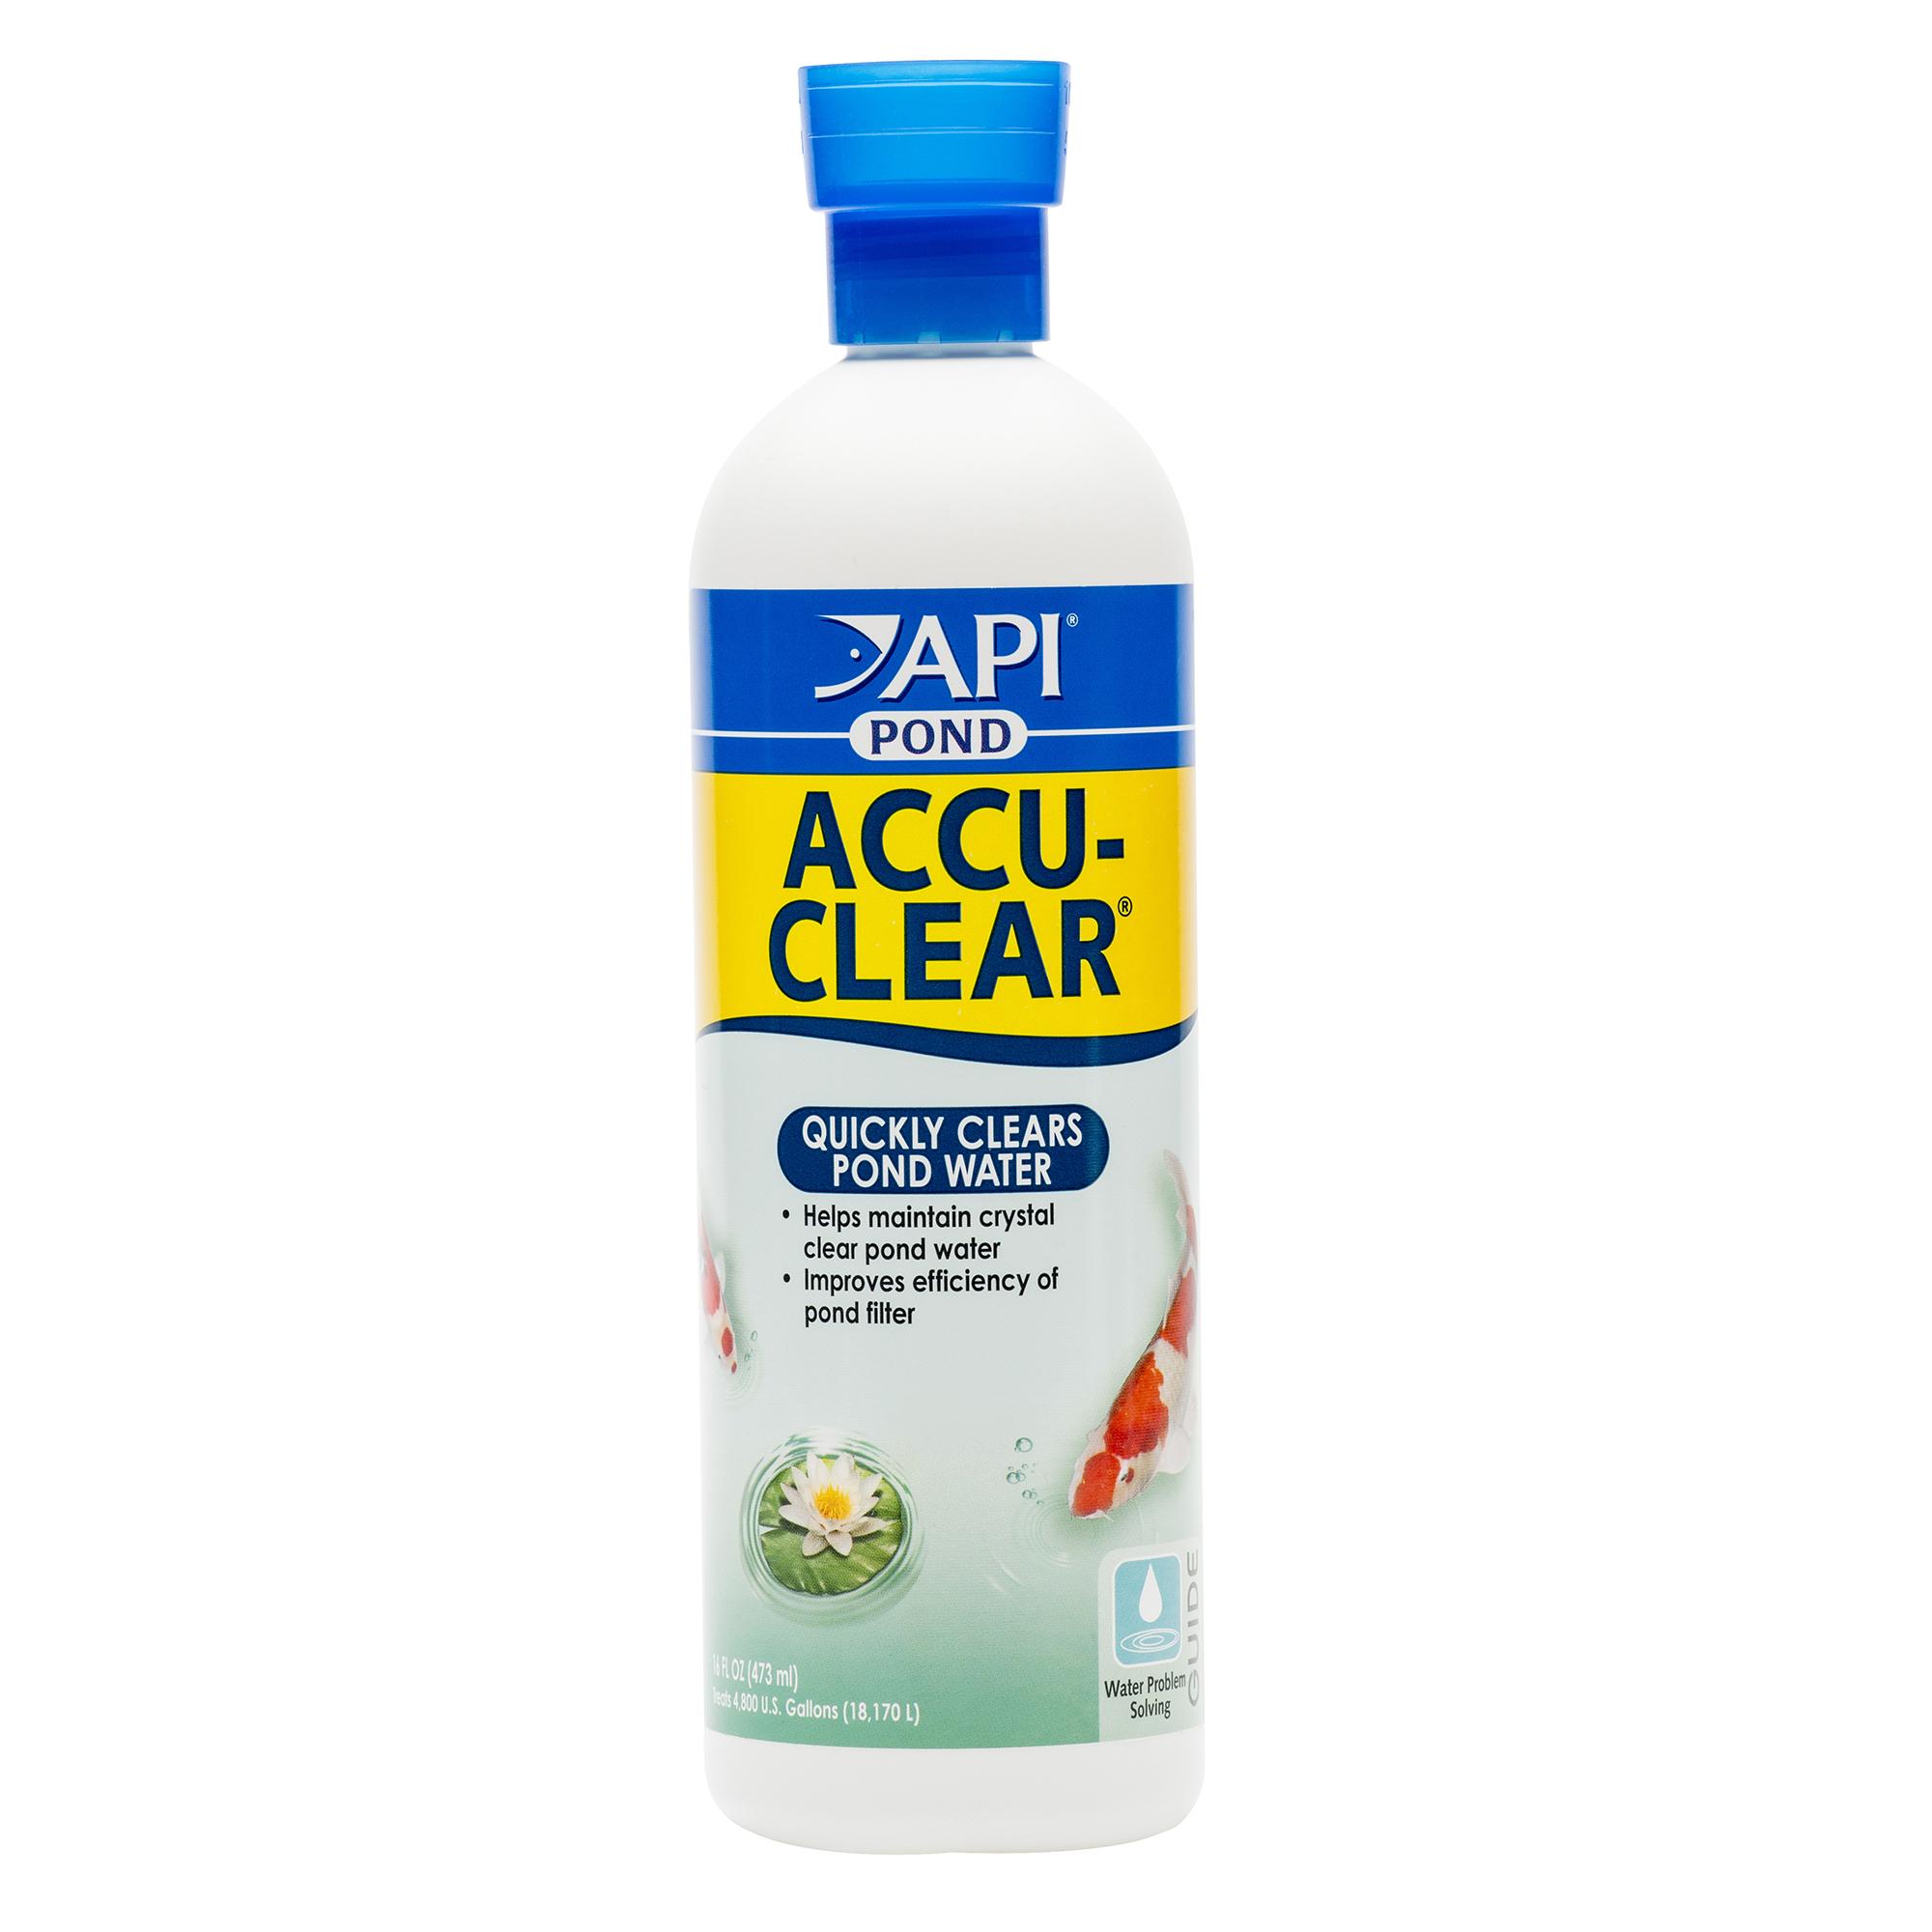 API POND ACCU-CLEAR water clarifier